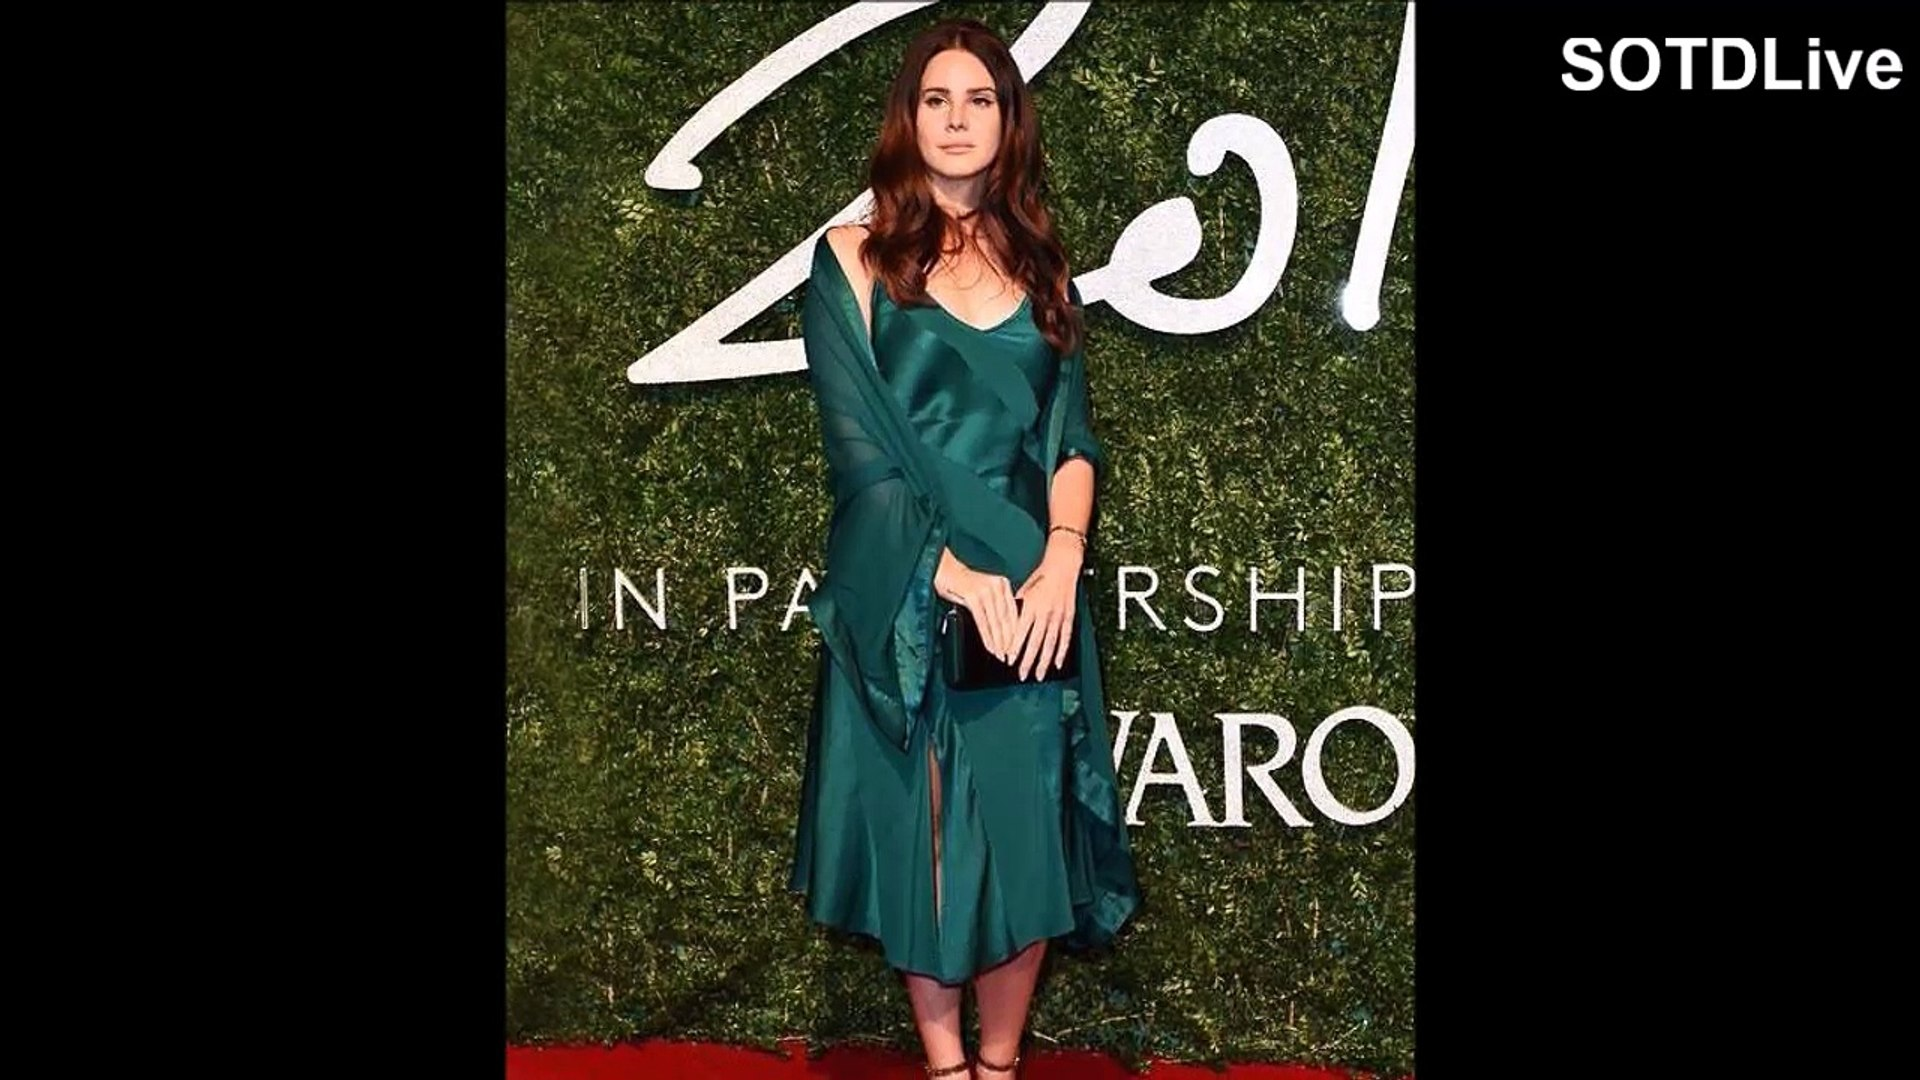 LANA DEL REY looks RAVISHING in GREEN DRESS | SOTDLive | Episode 10